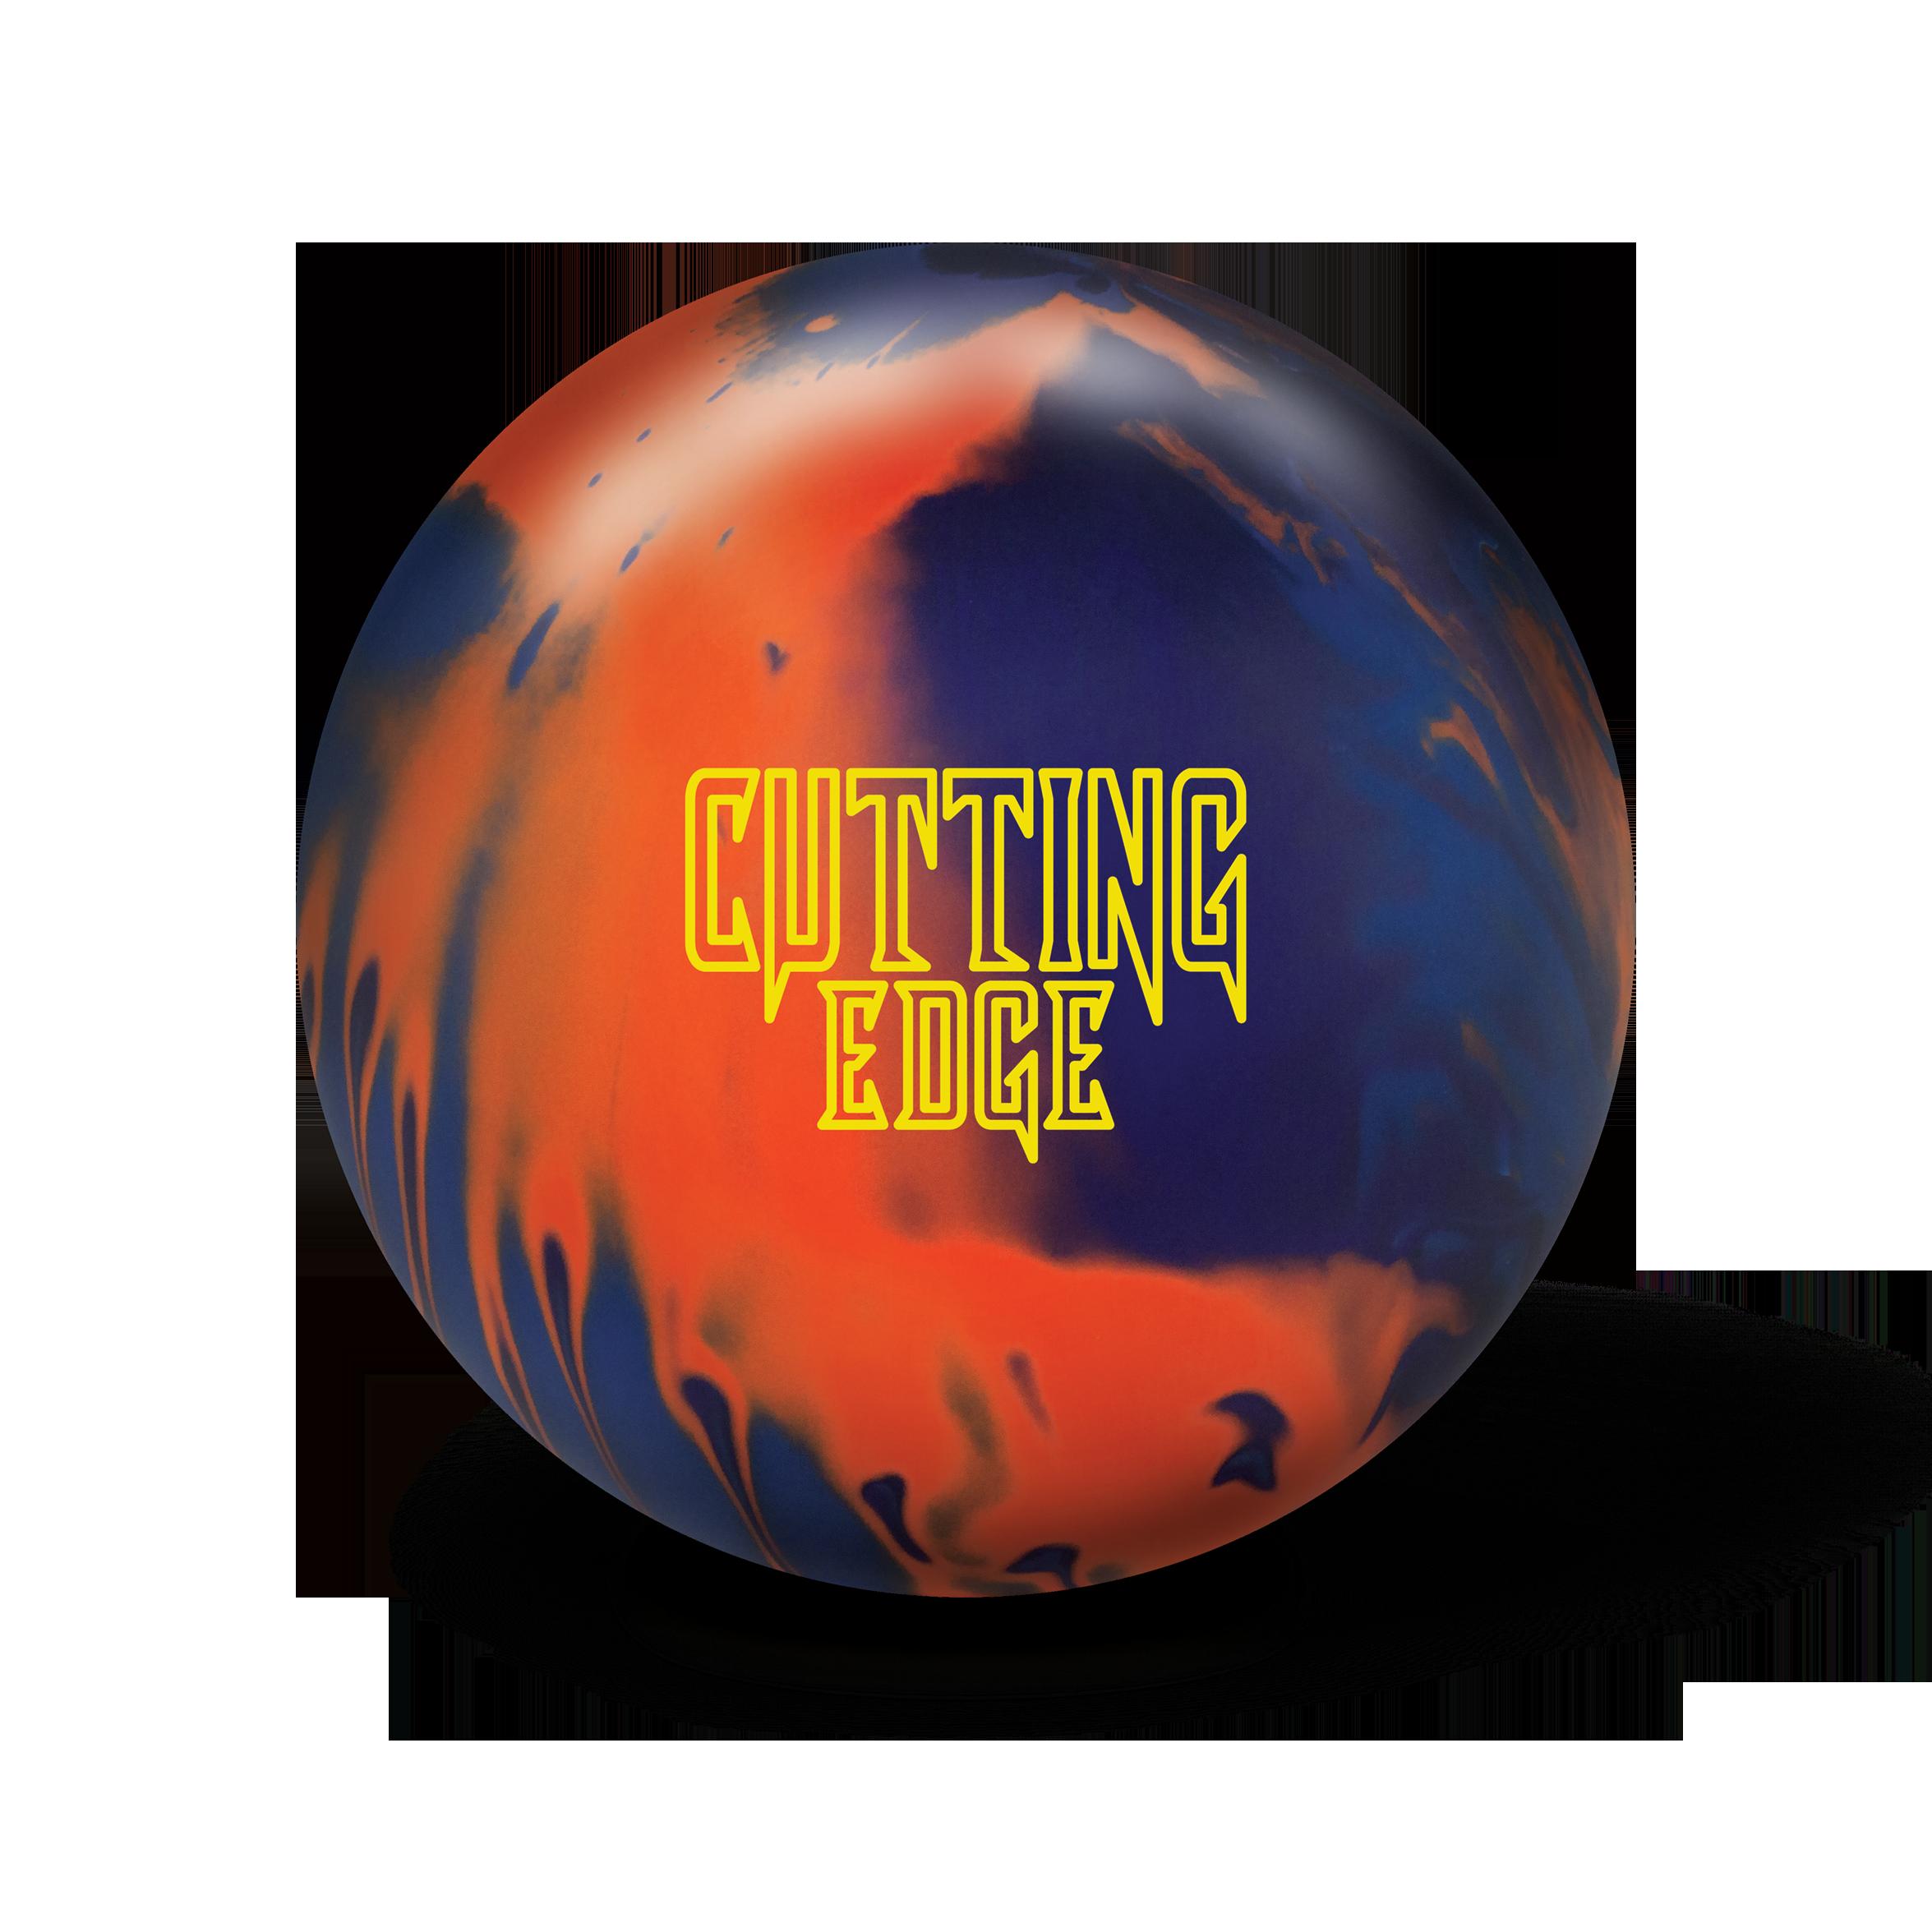 Brunswick Cutting Edge Pearl Bowling Ball- $109.95 Free Shipping